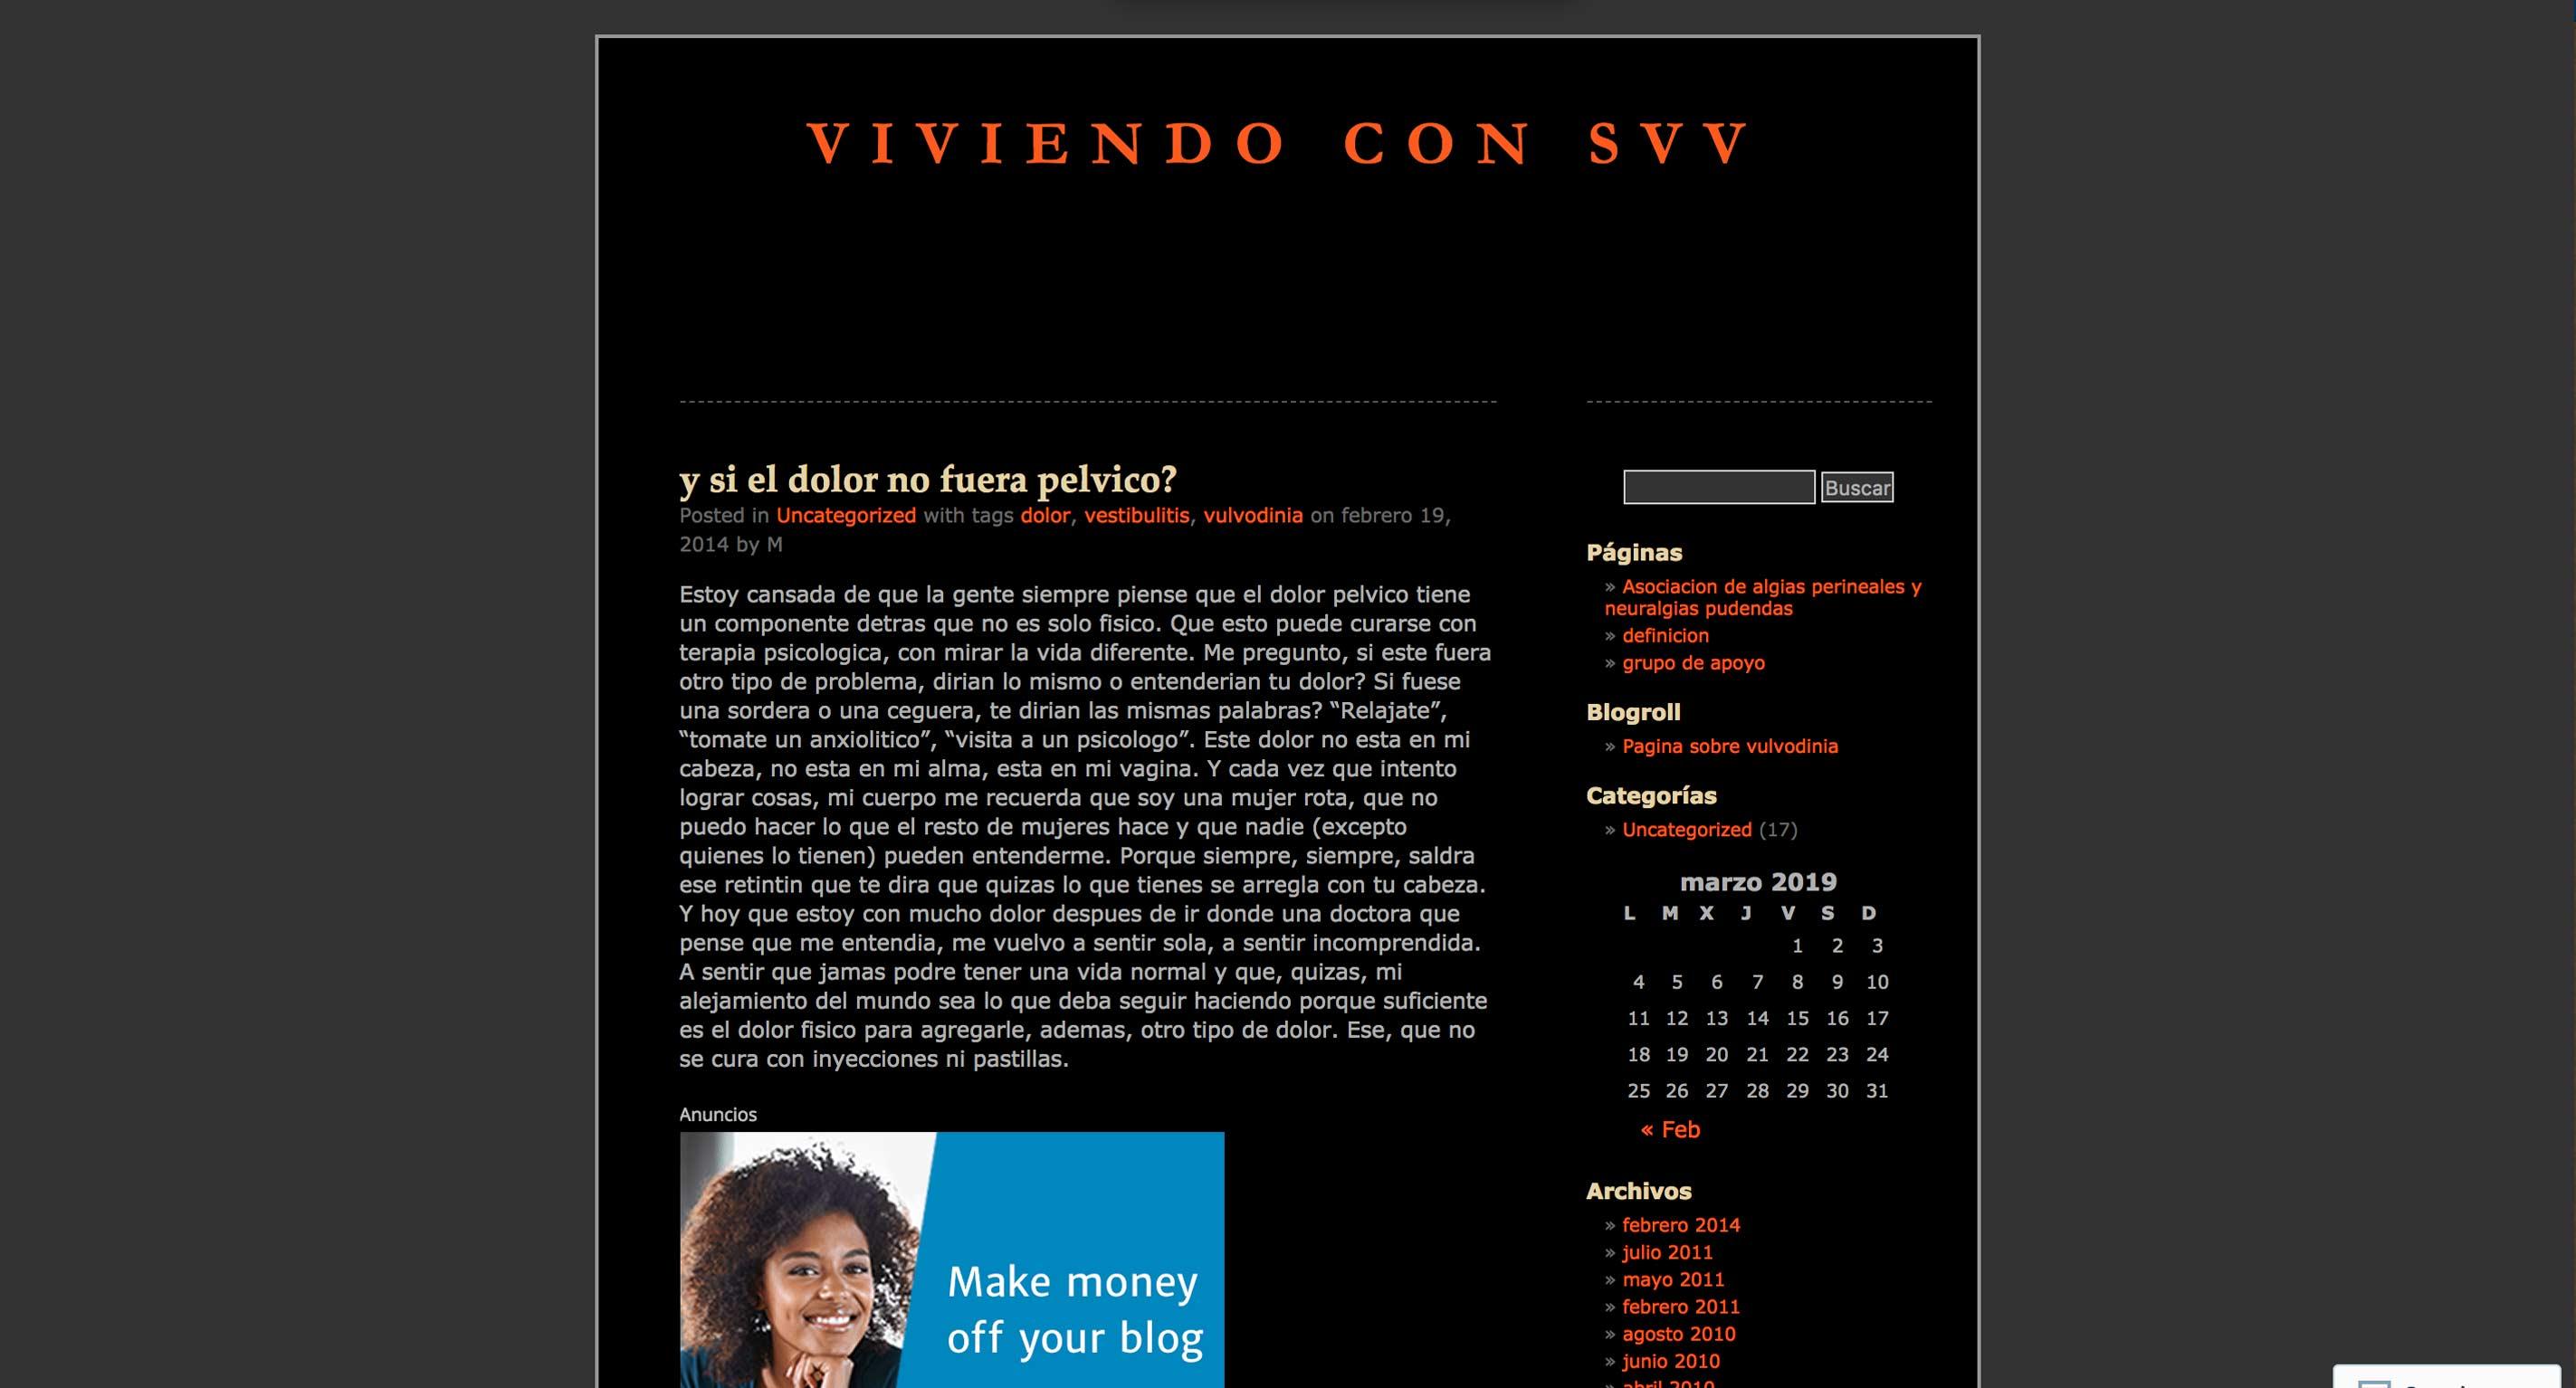 Blog about vulvodynia